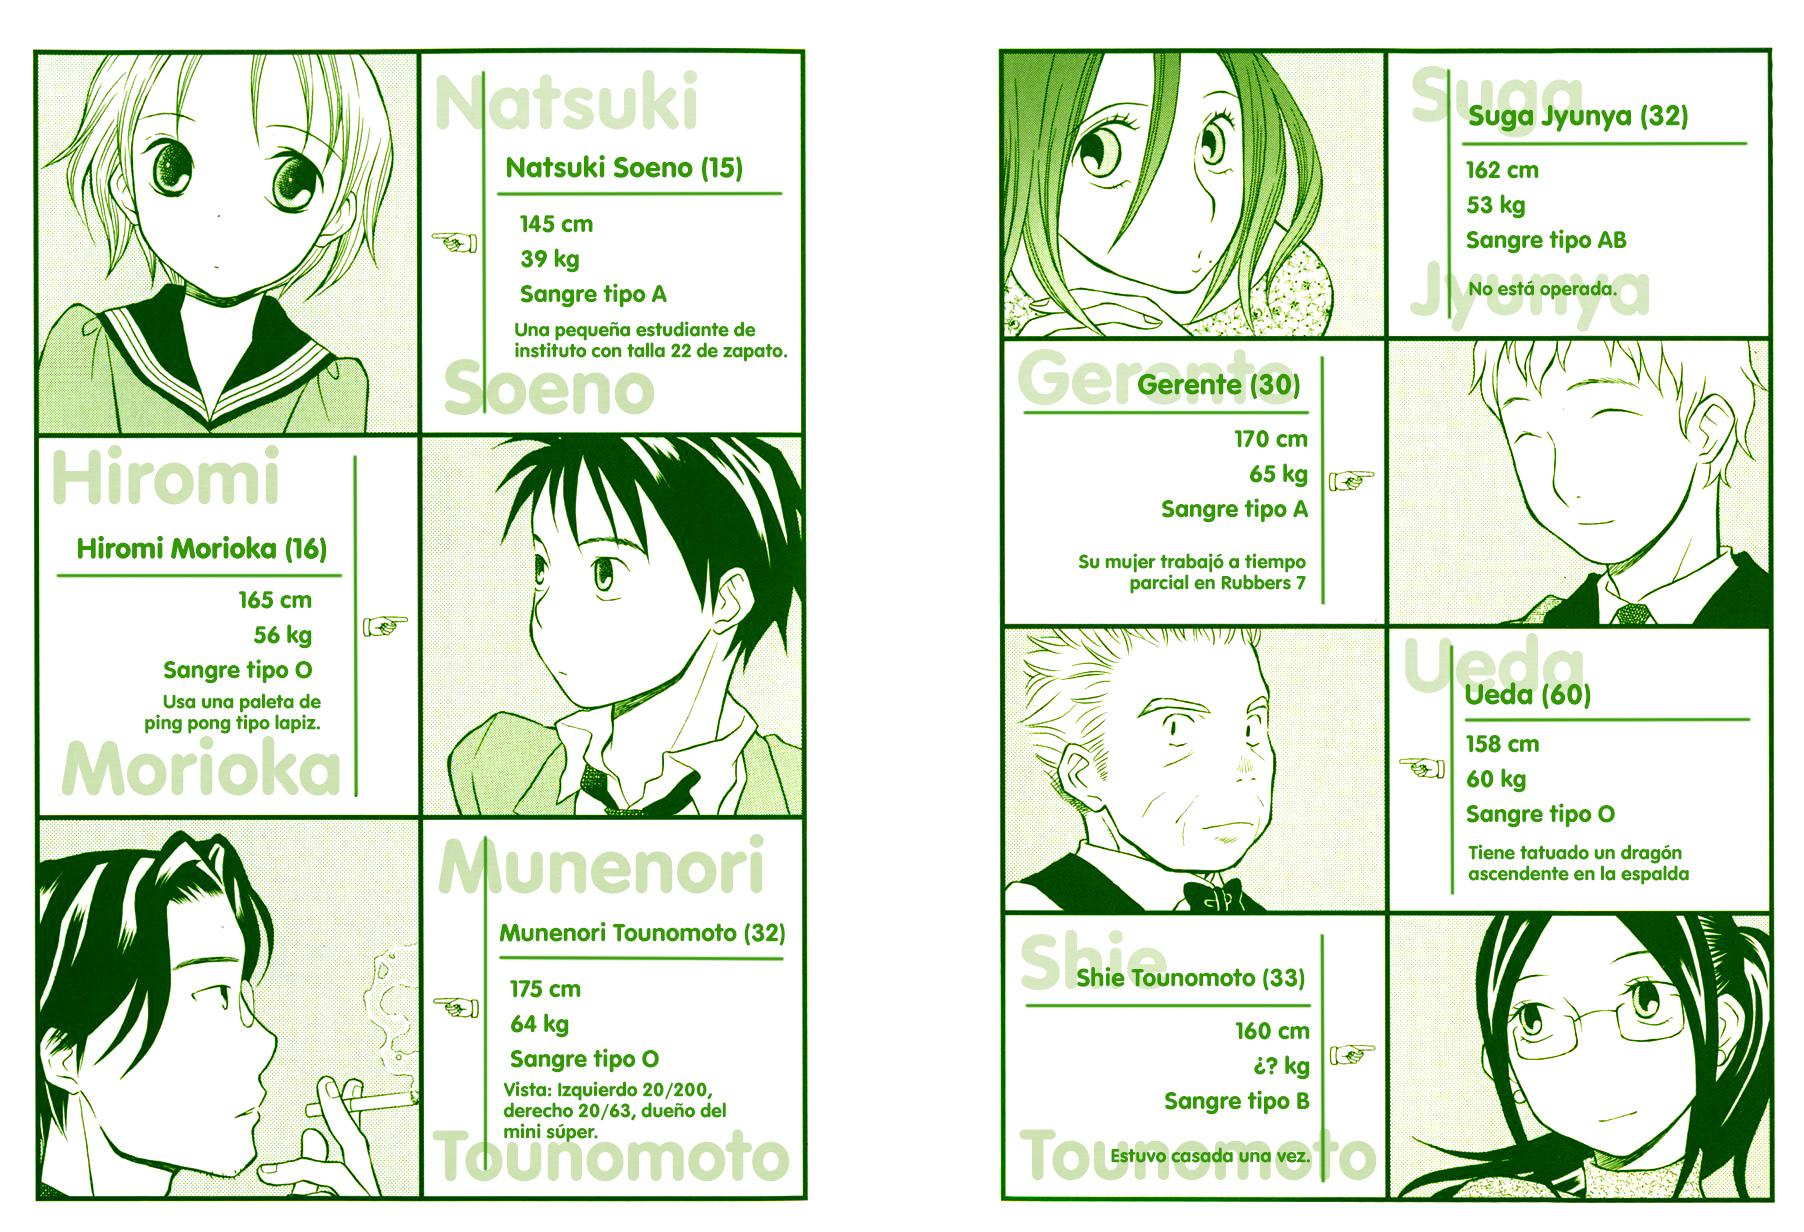 https://c5.ninemanga.com/es_manga/42/18858/438405/ef7376488f5cf2a998740274c1ea1f29.jpg Page 3